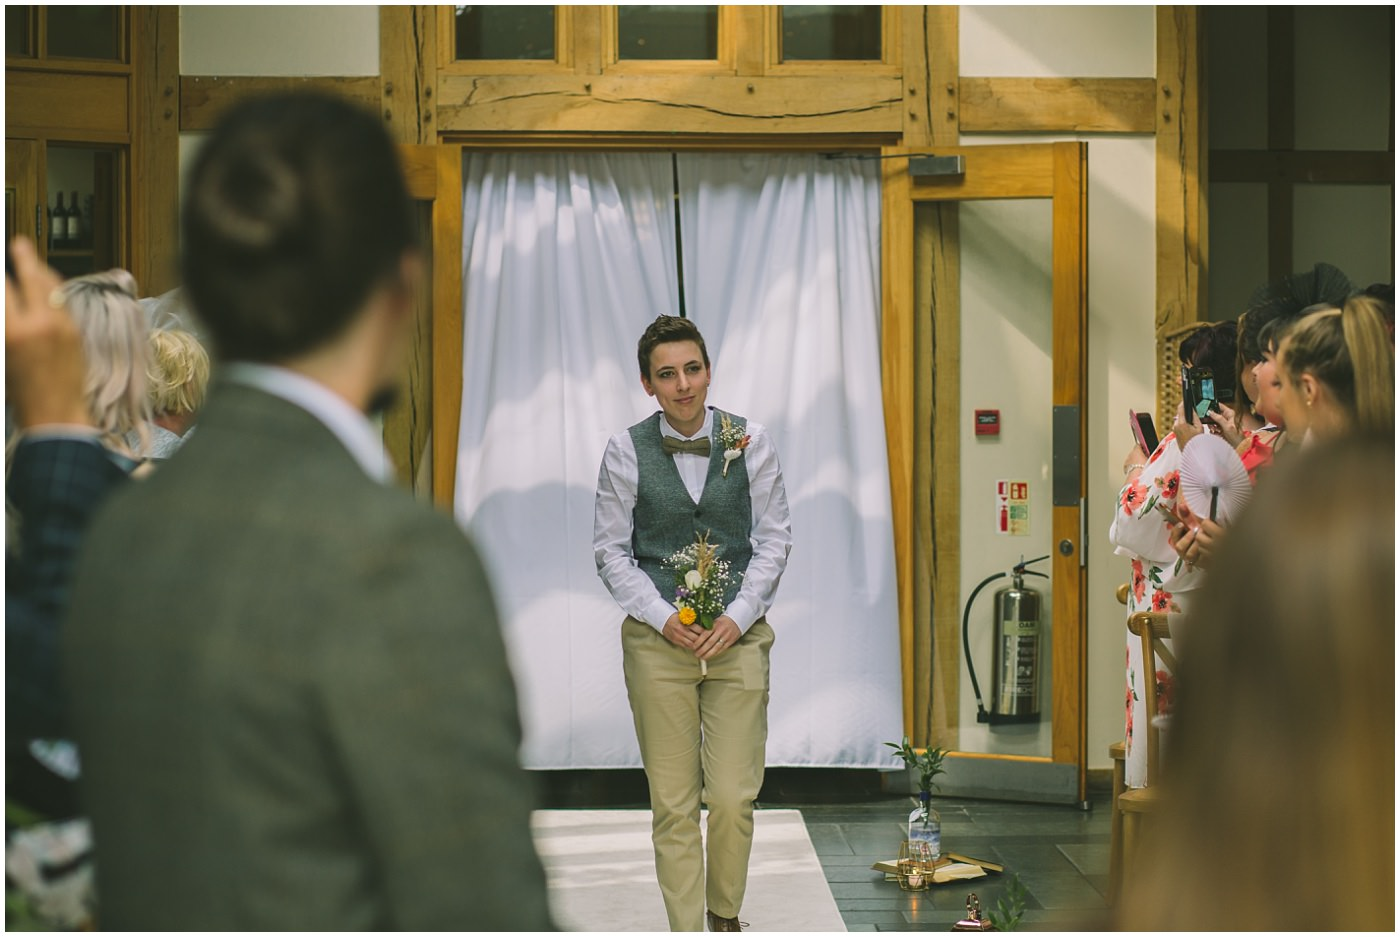 Bridesmaid wearing waistcoat walks down the isle